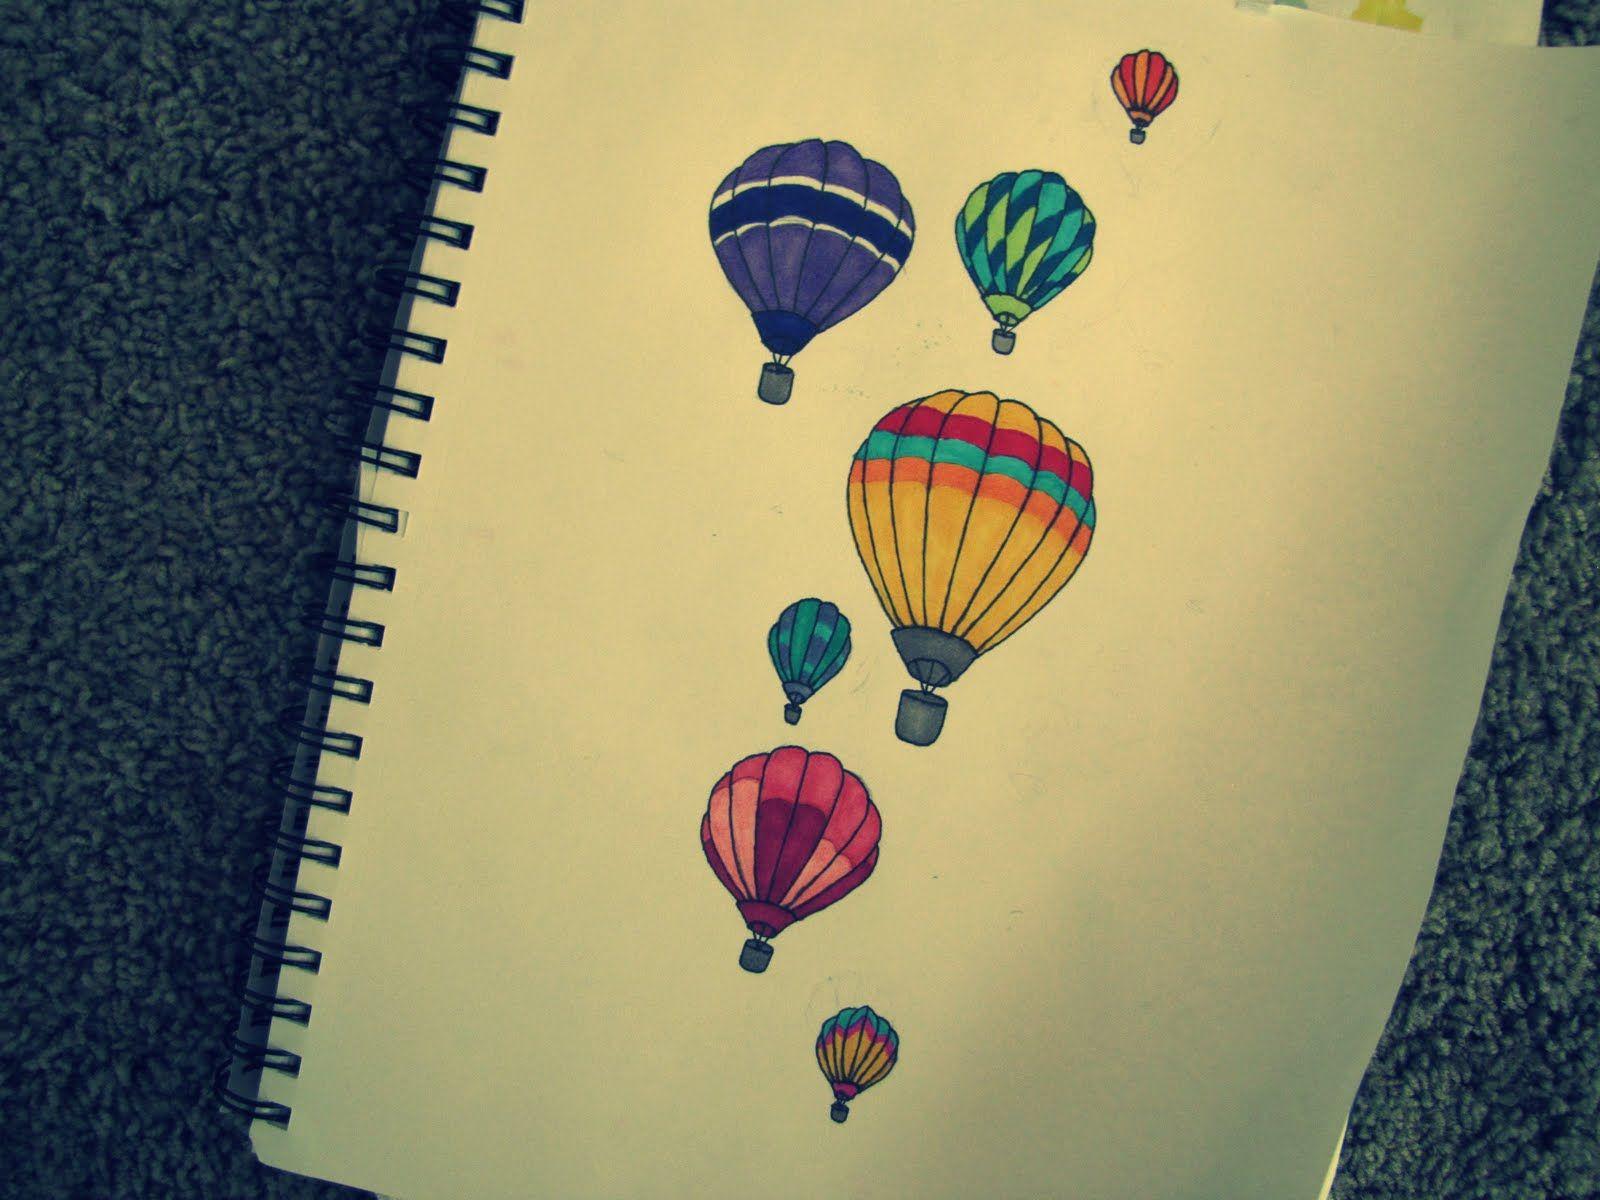 balloon drawing tumblr - photo #35